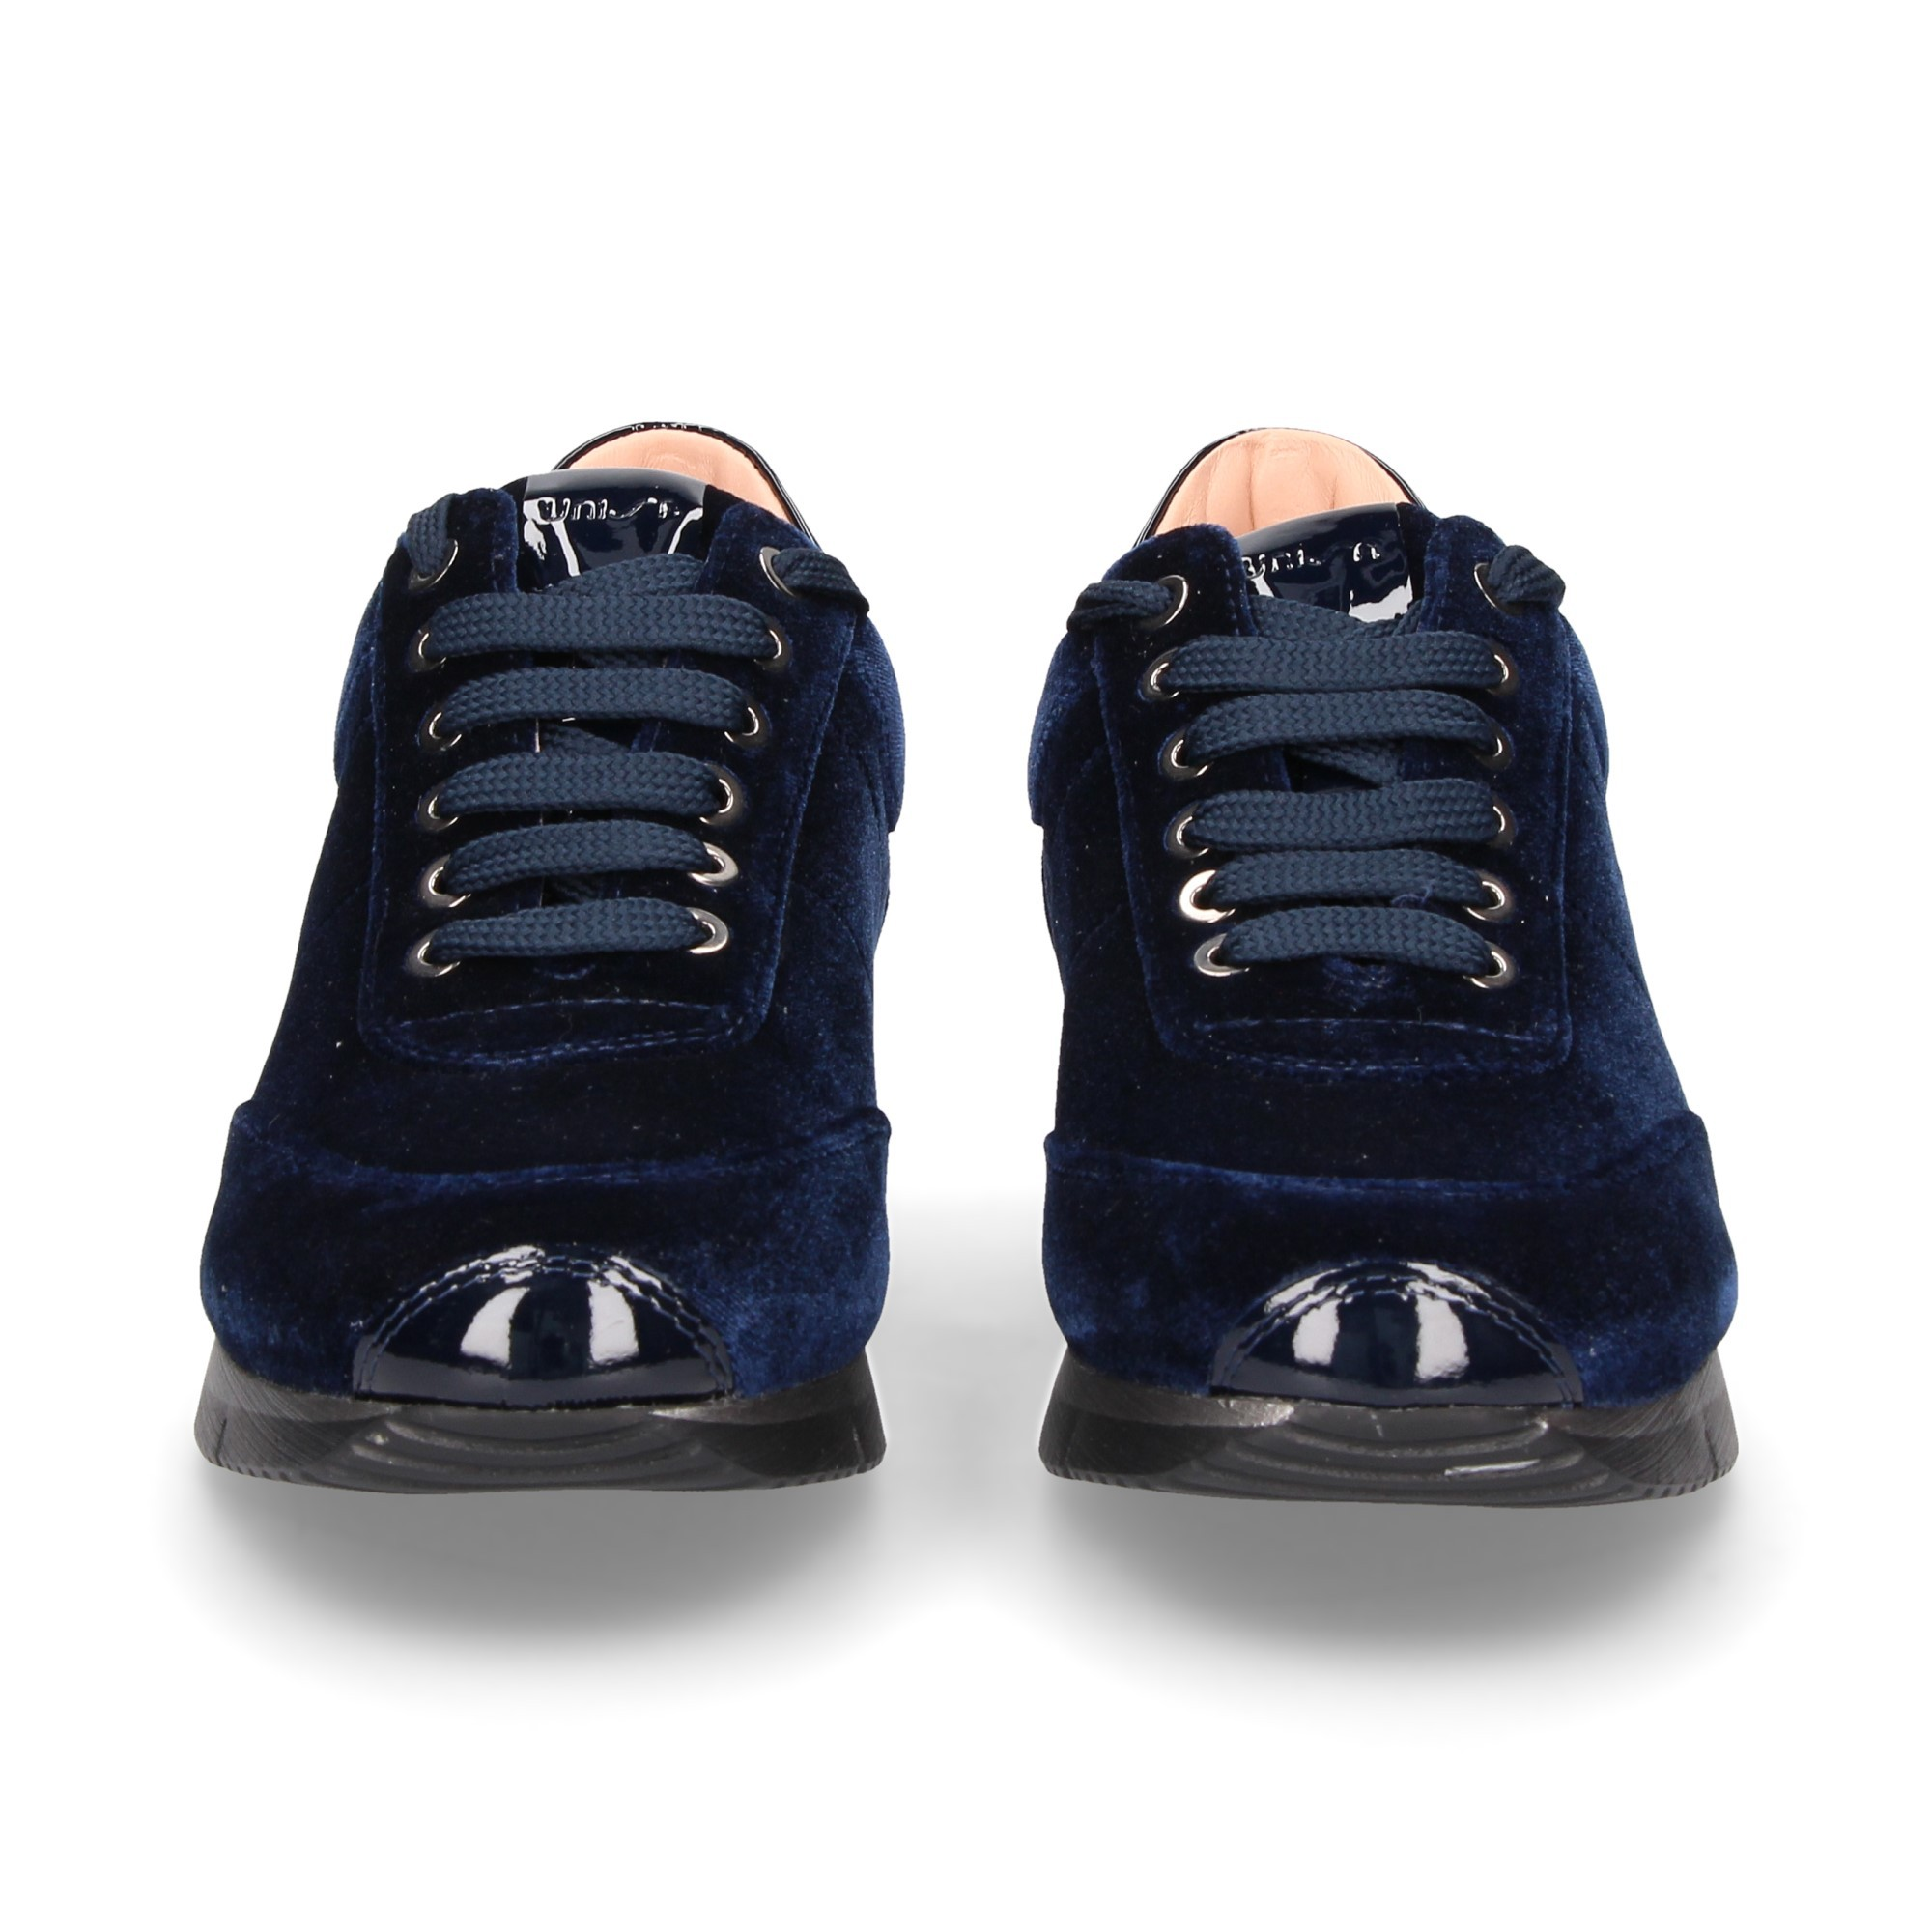 SKECHERS Zapatillas de Mujer 15900 NVY AZUL